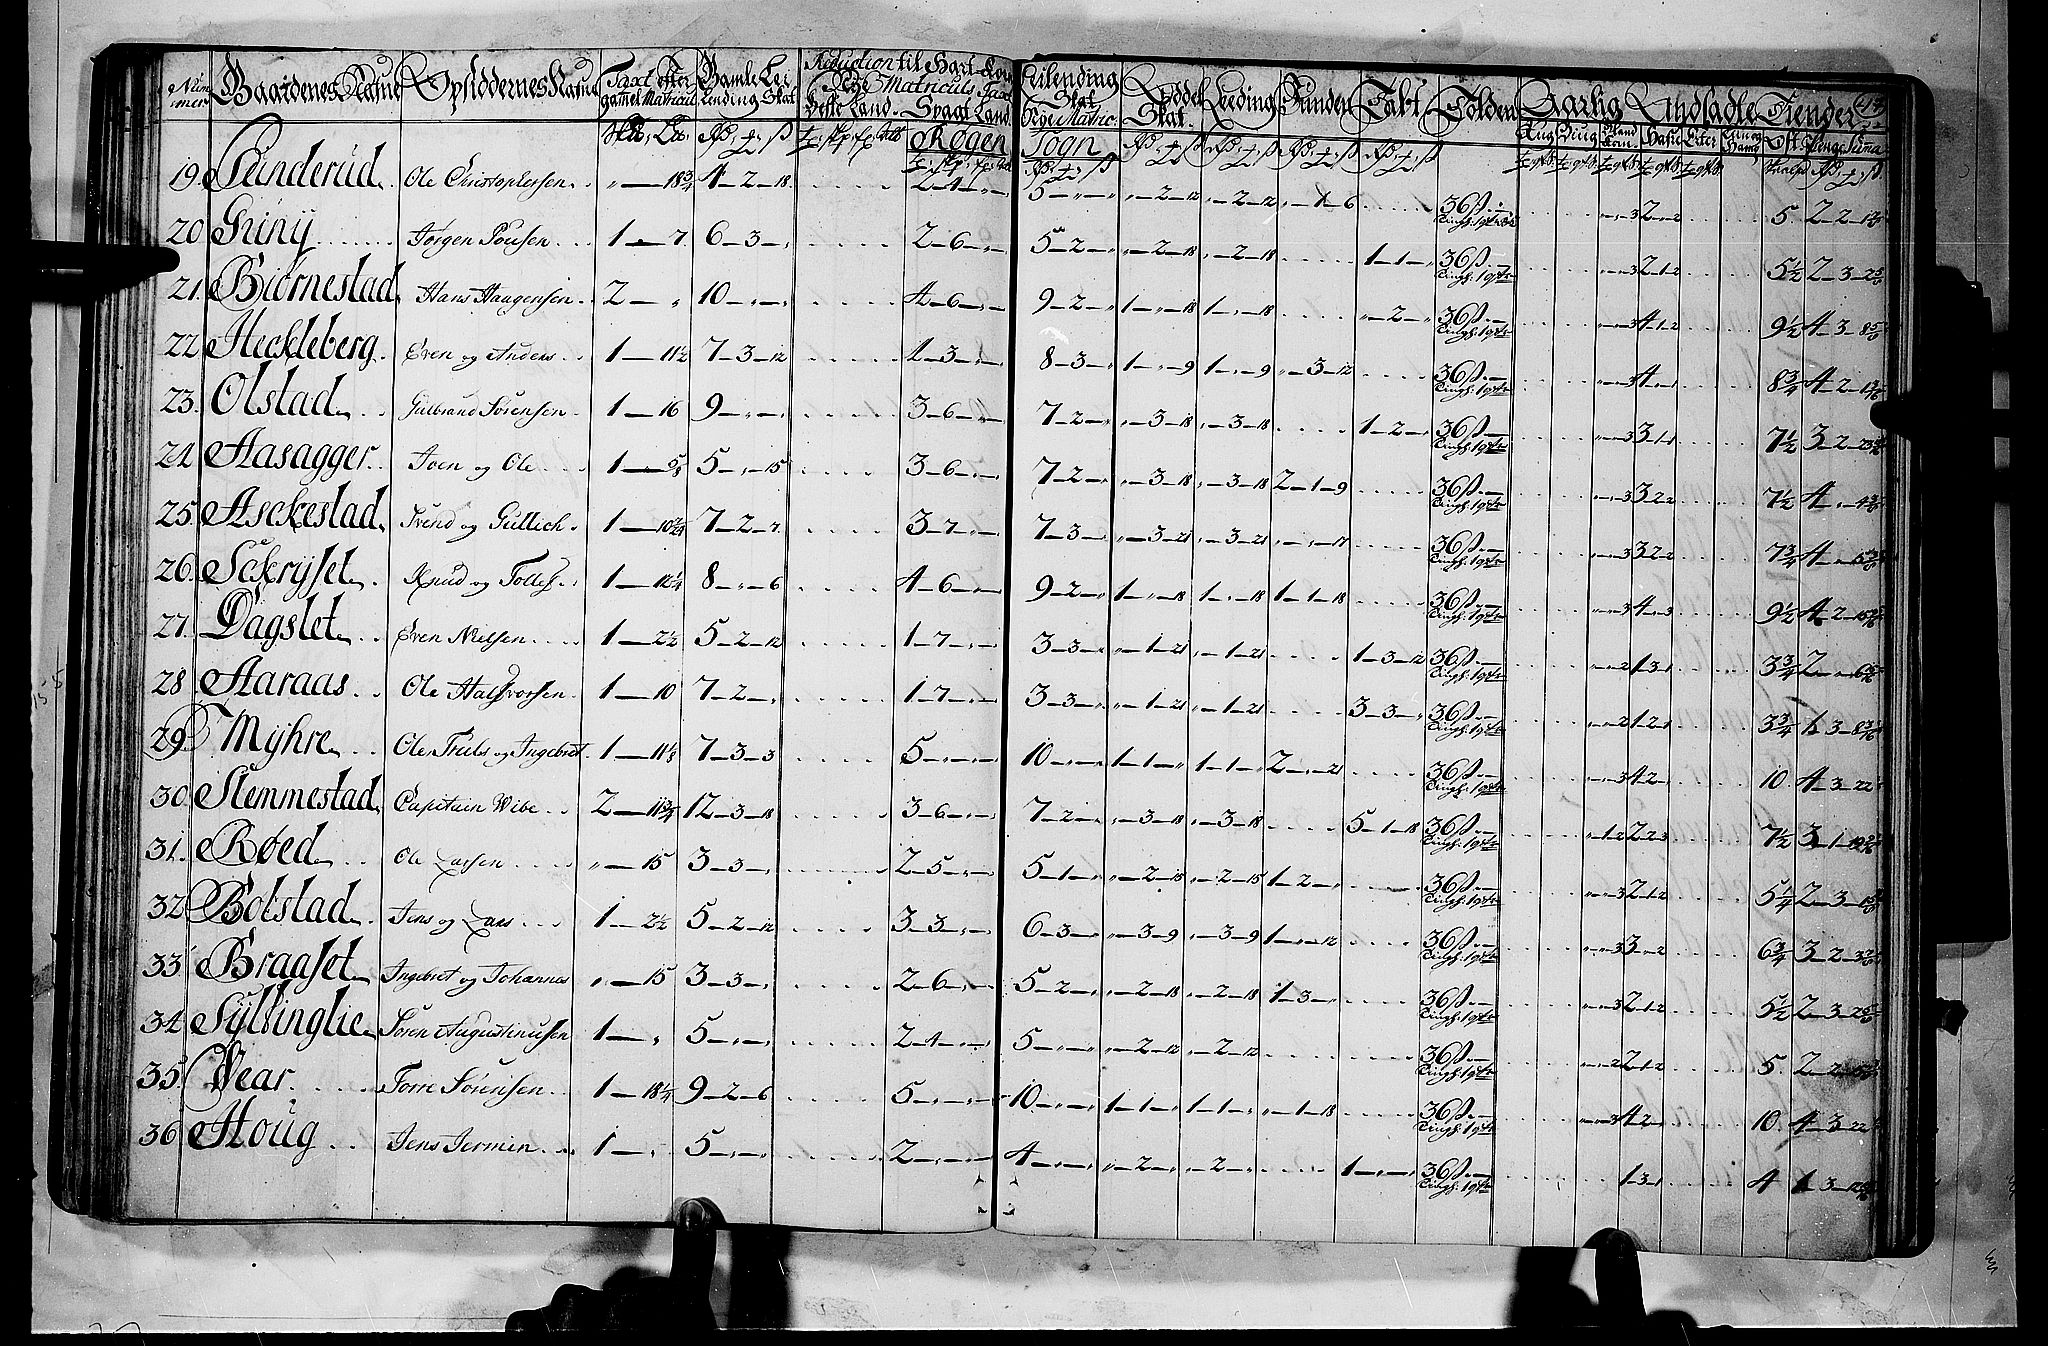 RA, Rentekammeret inntil 1814, Realistisk ordnet avdeling, N/Nb/Nbf/L0112: Buskerud matrikkelprotokoll, 1723, p. 49